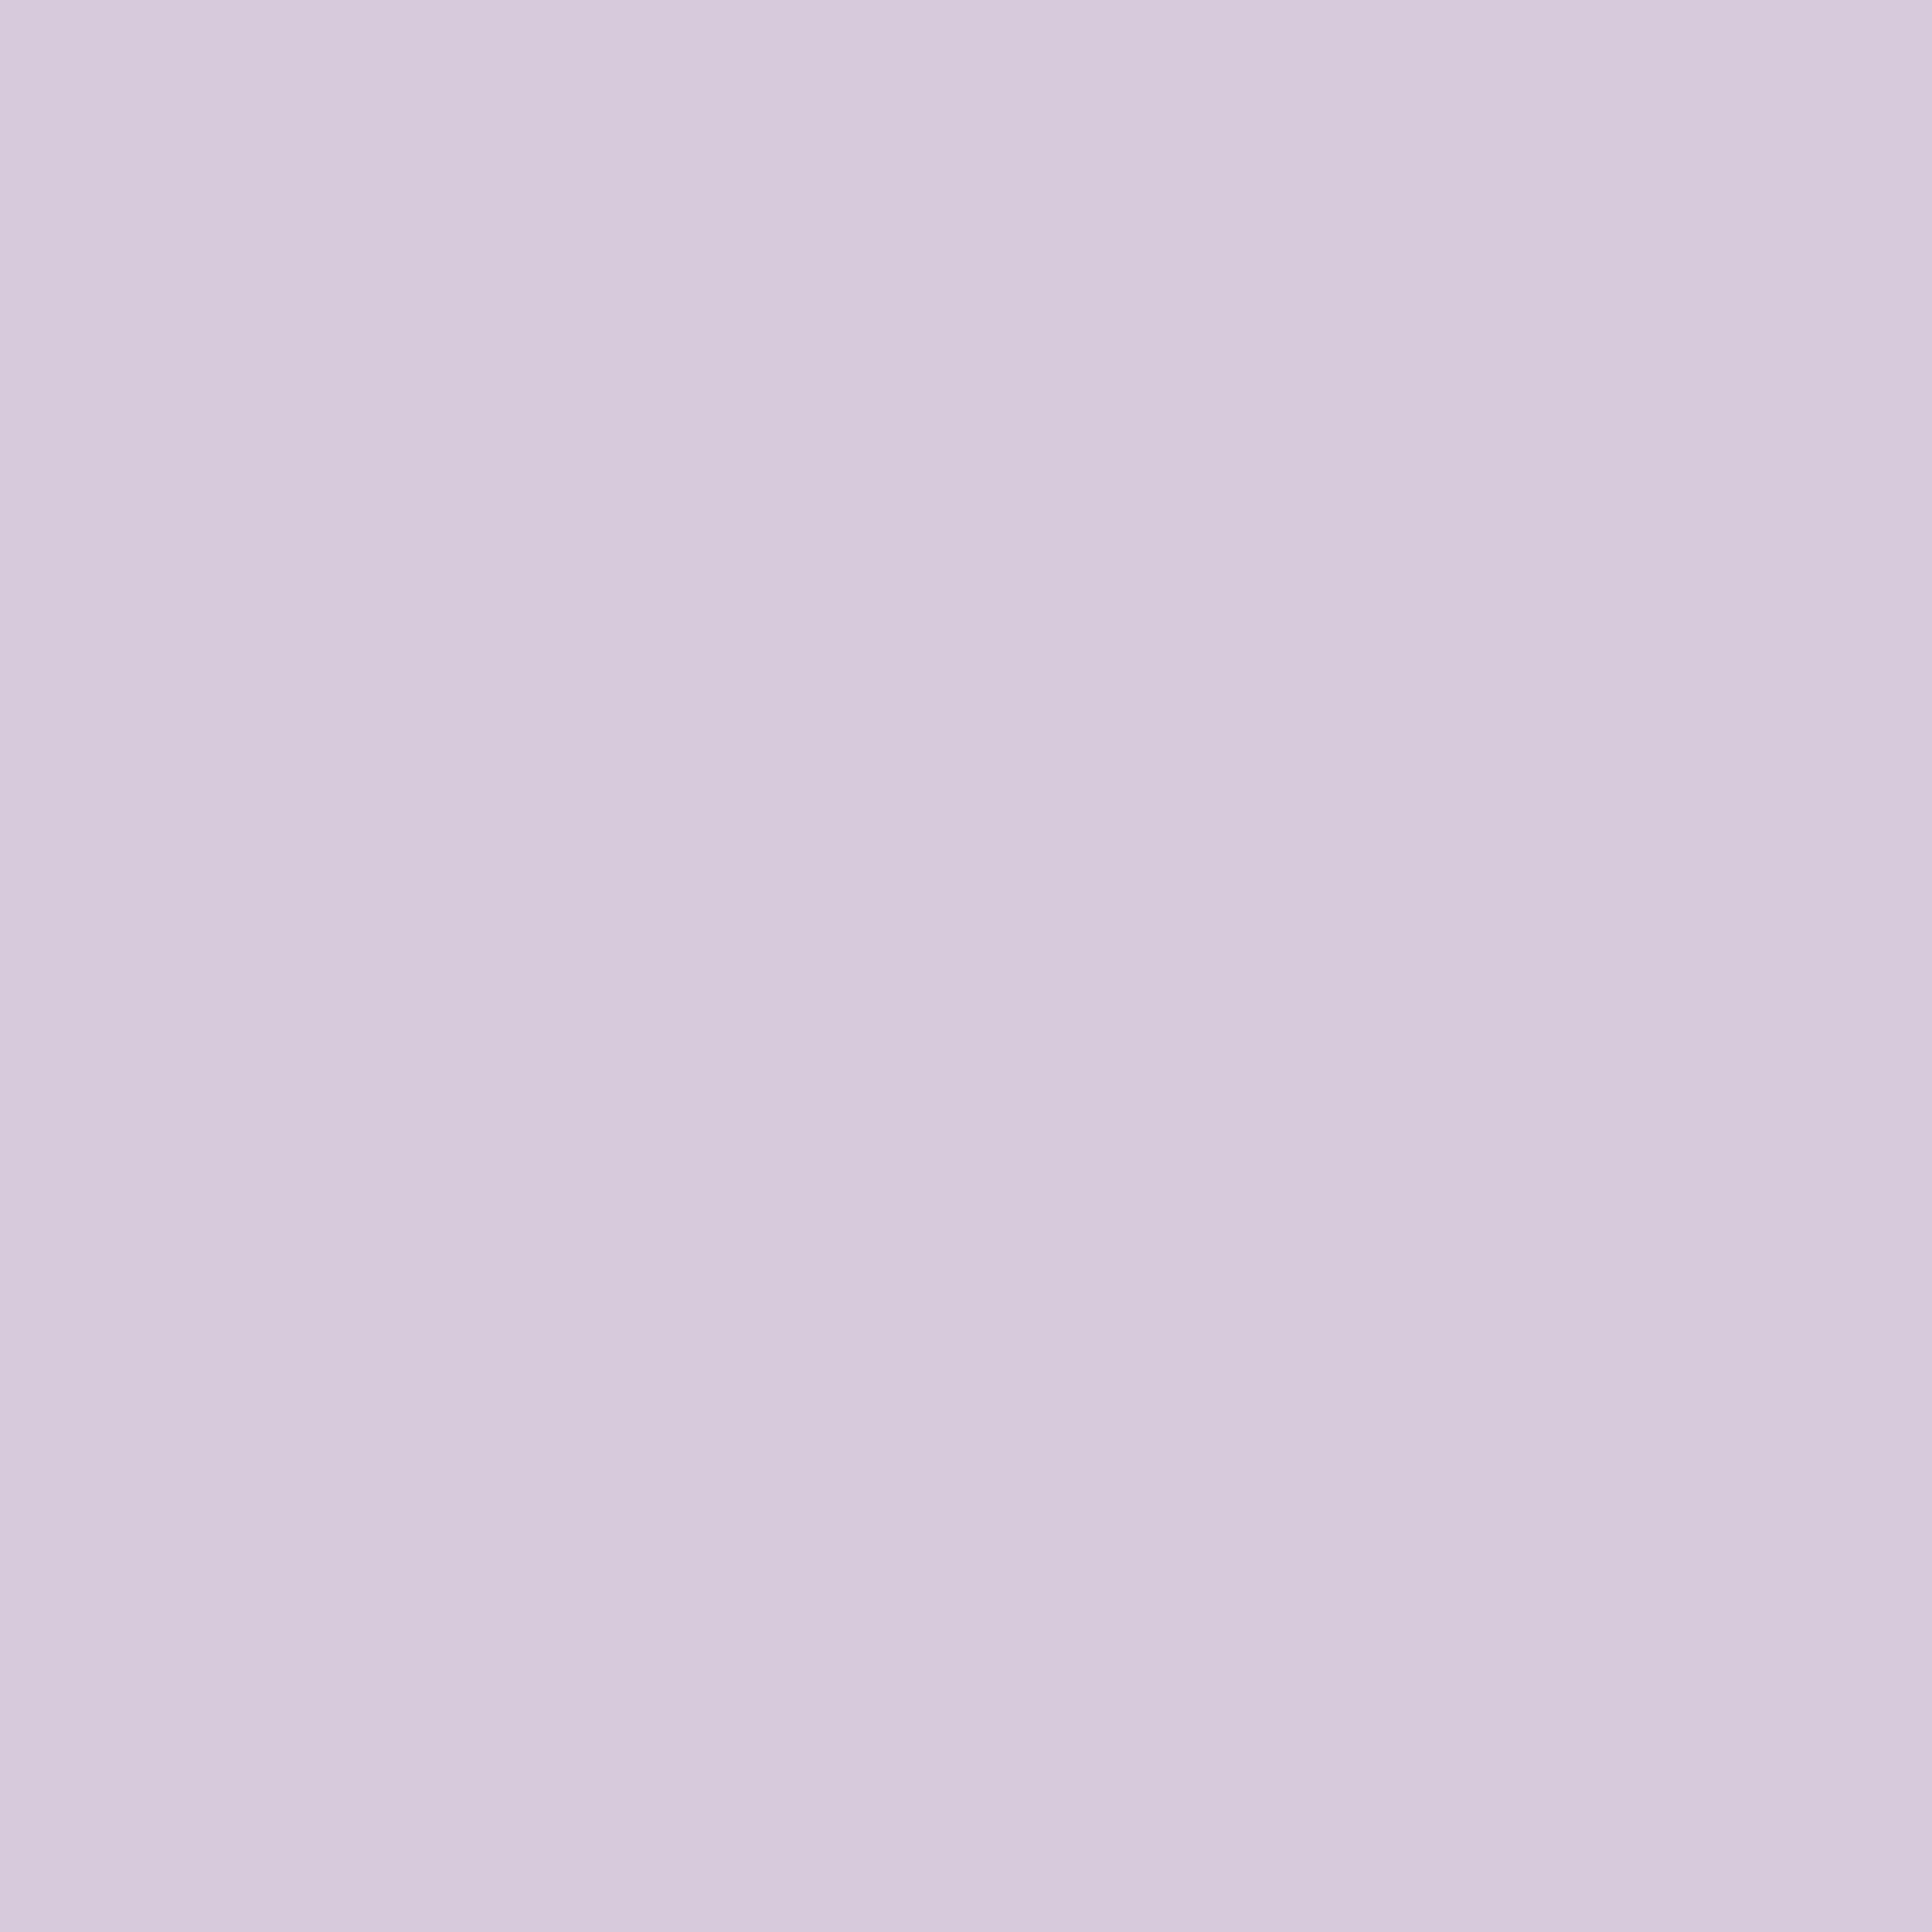 3600x3600 Languid Lavender Solid Color Background